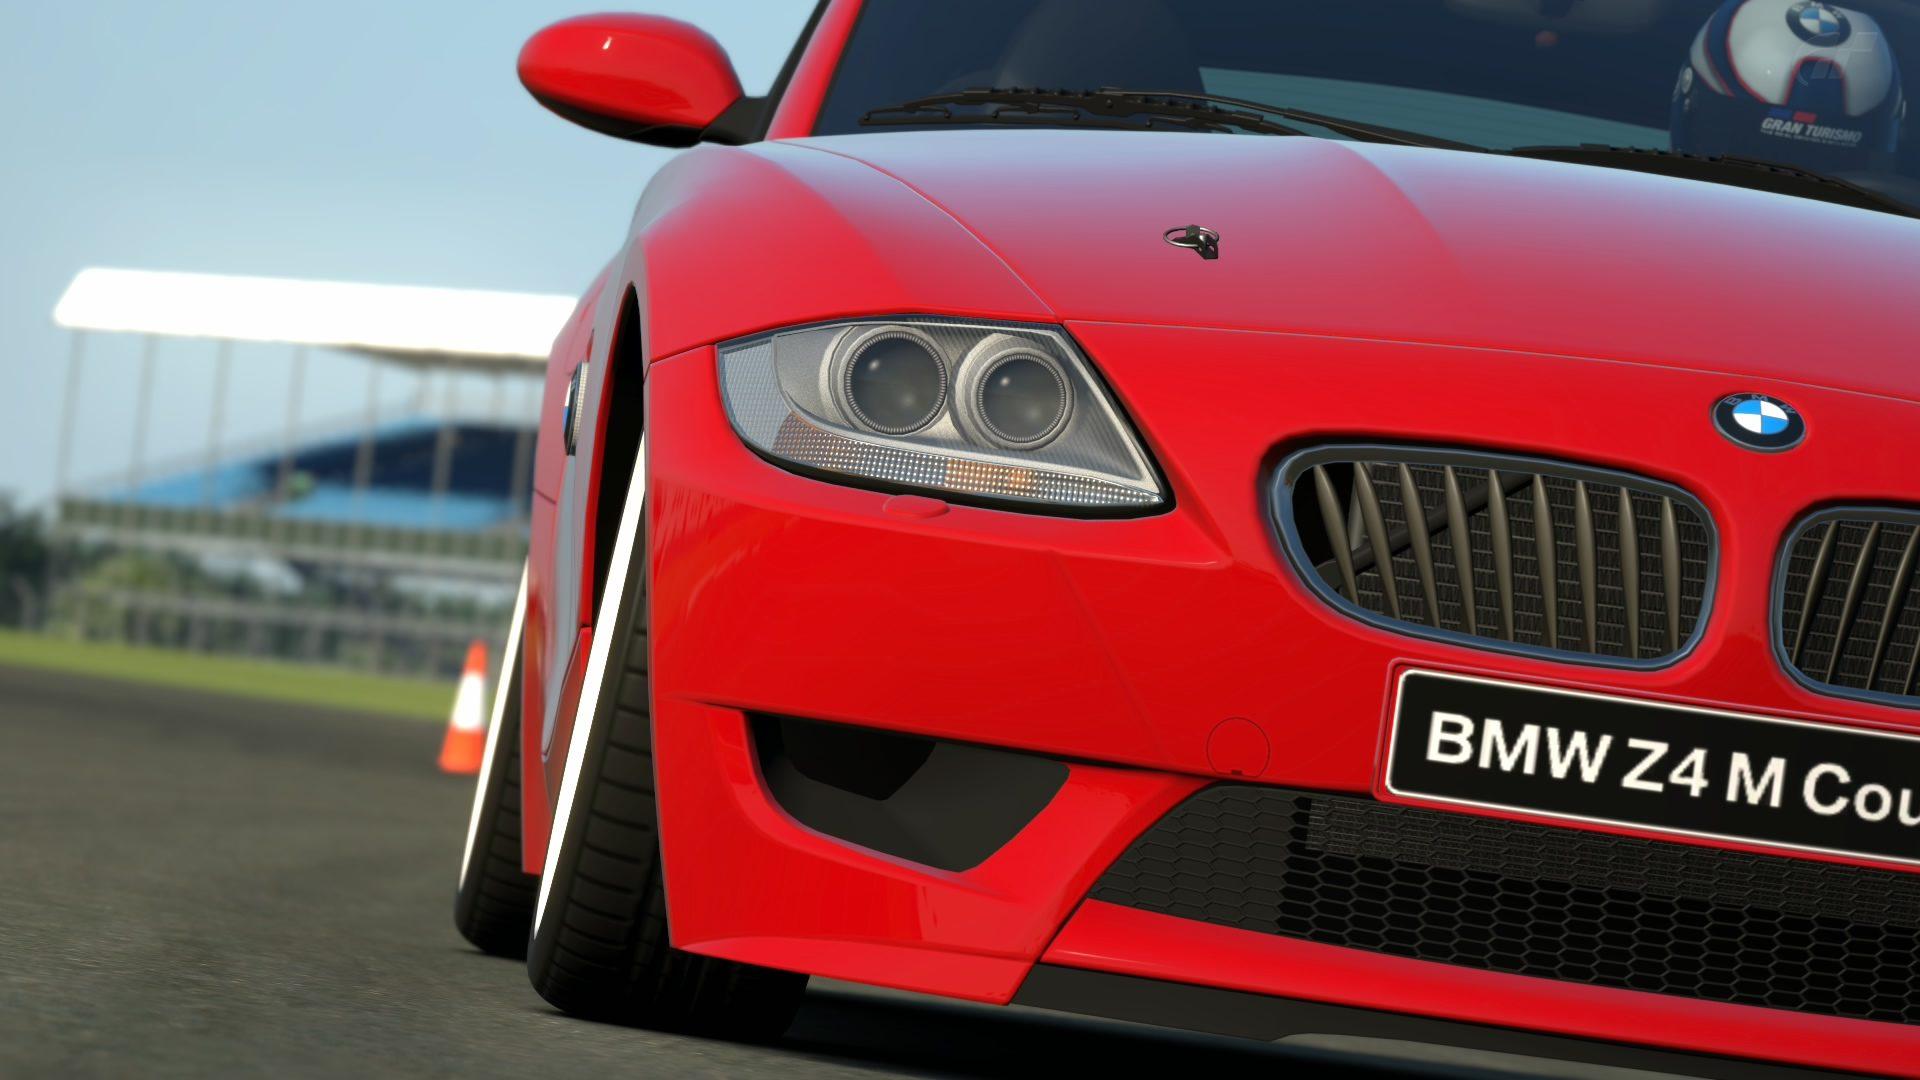 BMW Z4 Silverstone Grand Prix Circuit_2.jpg